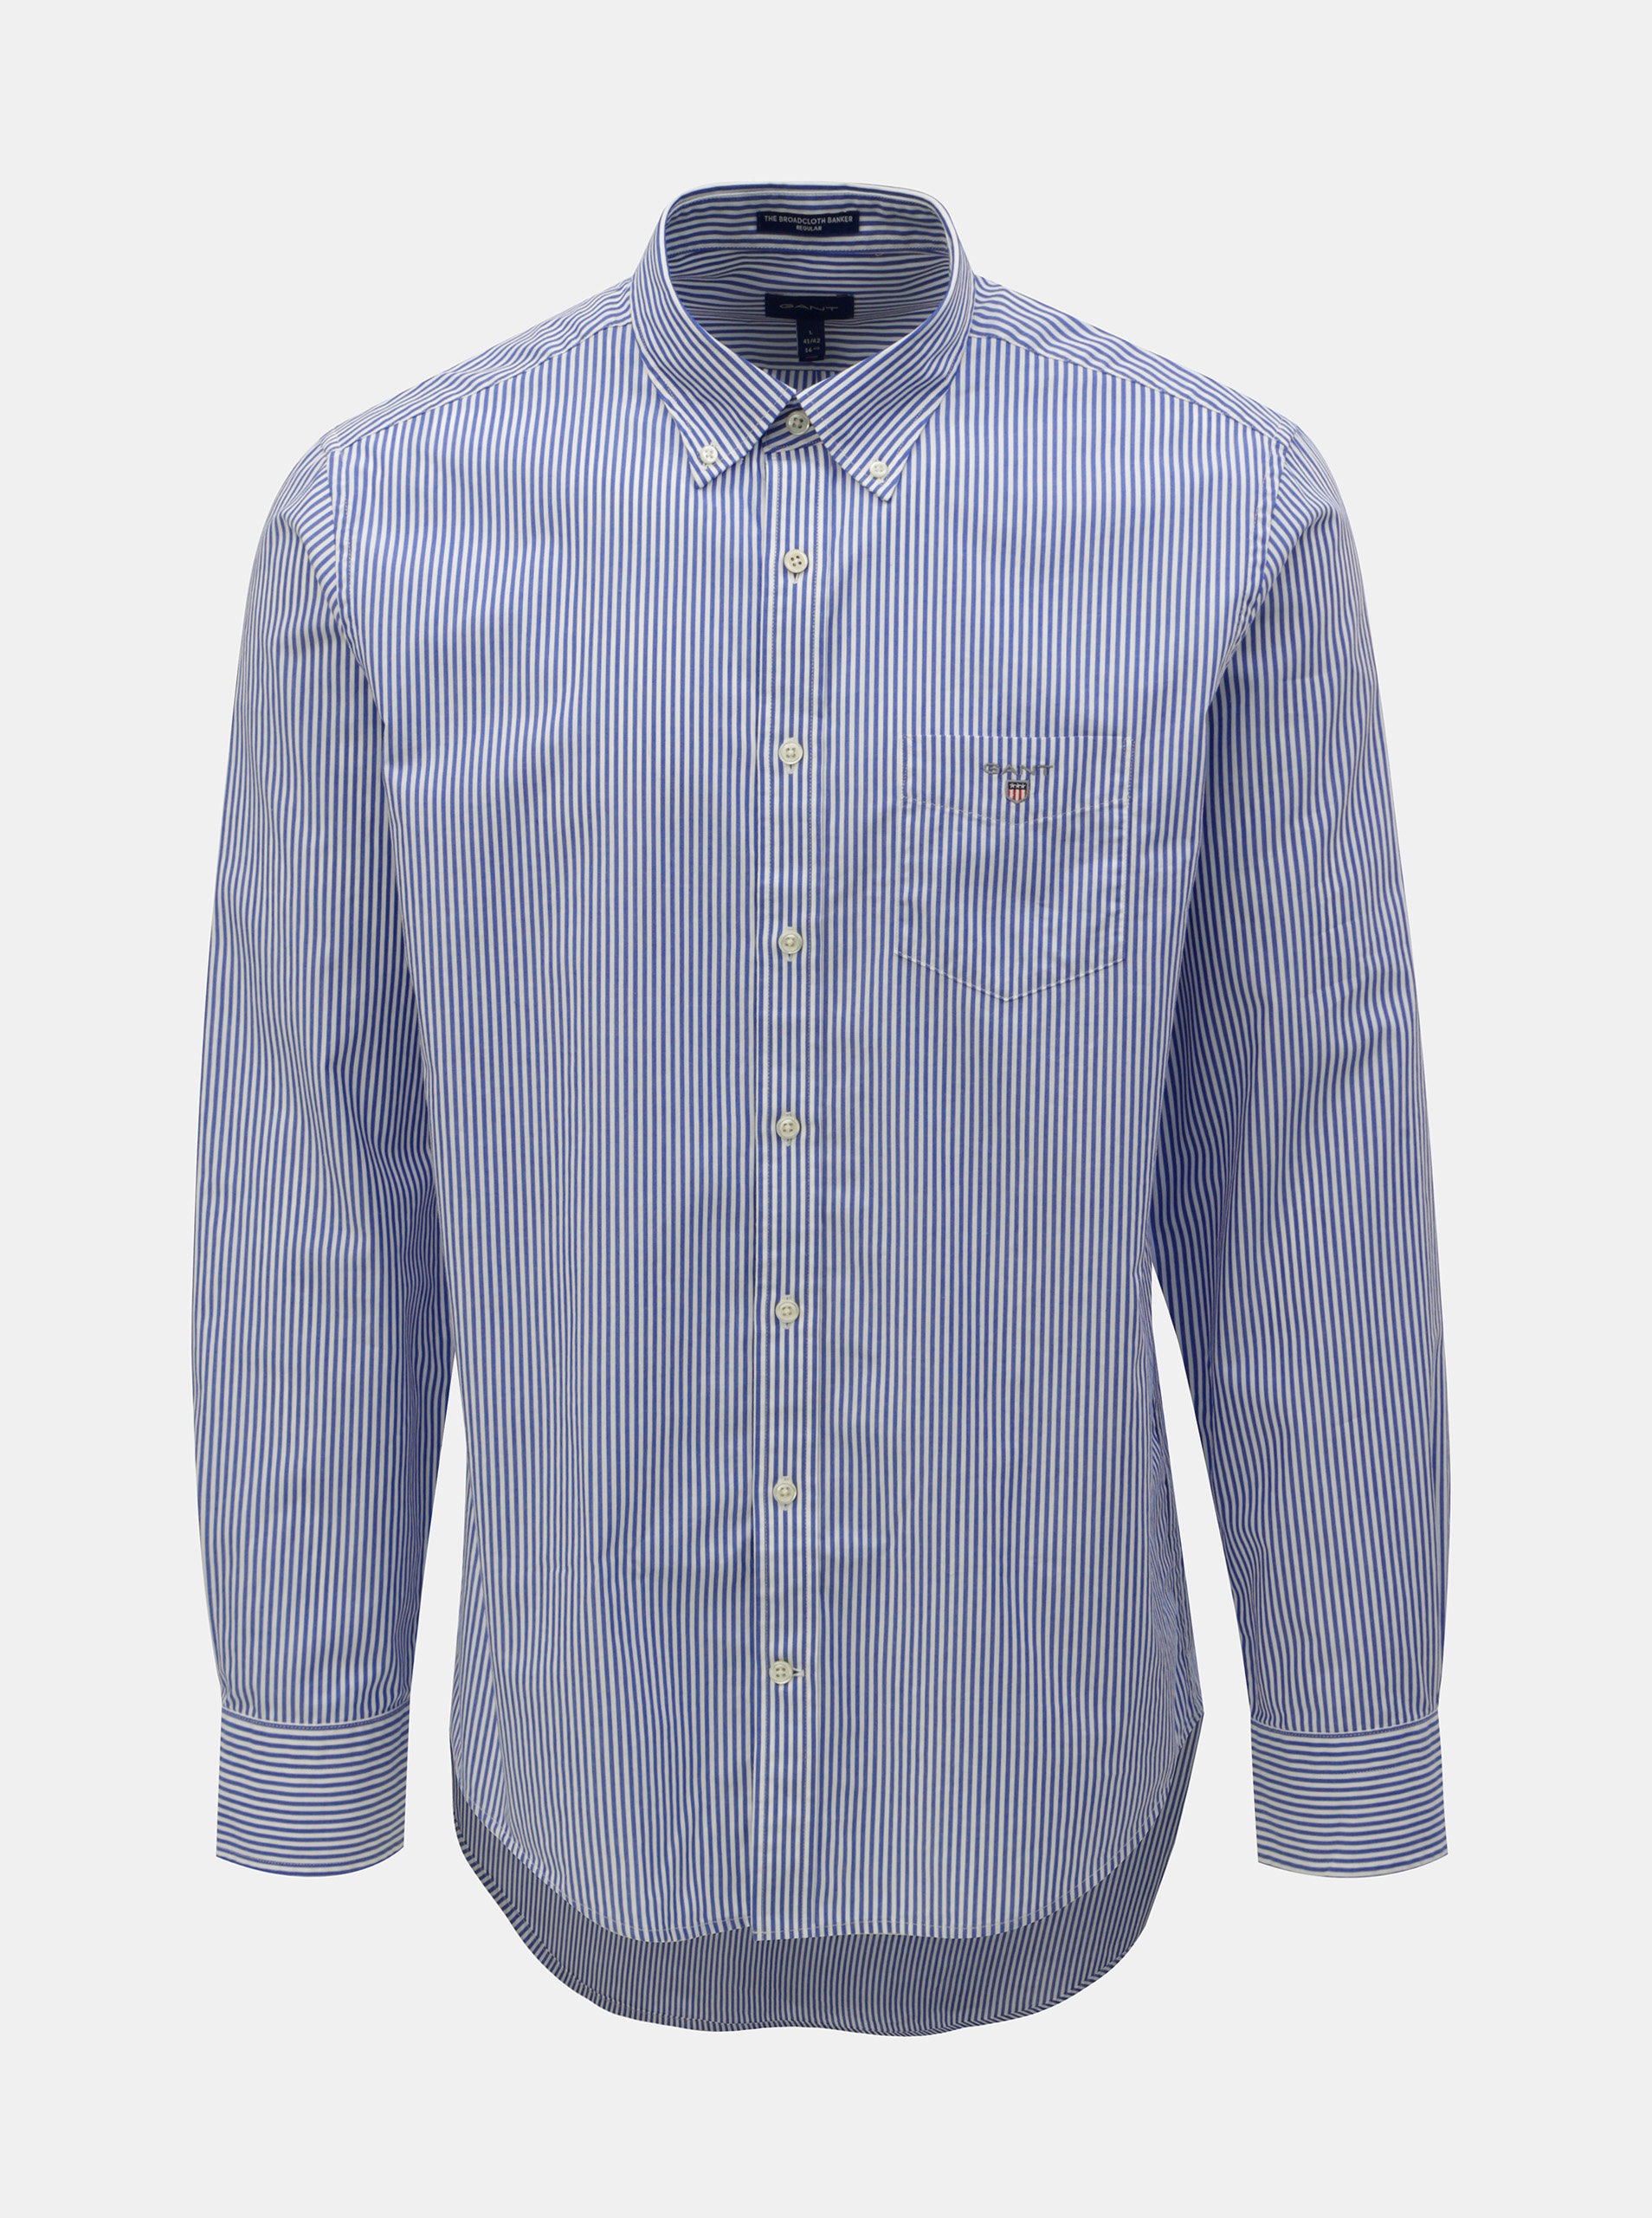 bf4c8593deaa Bielo–modrá pánska pruhovaná regular fit košeľa GANT ...